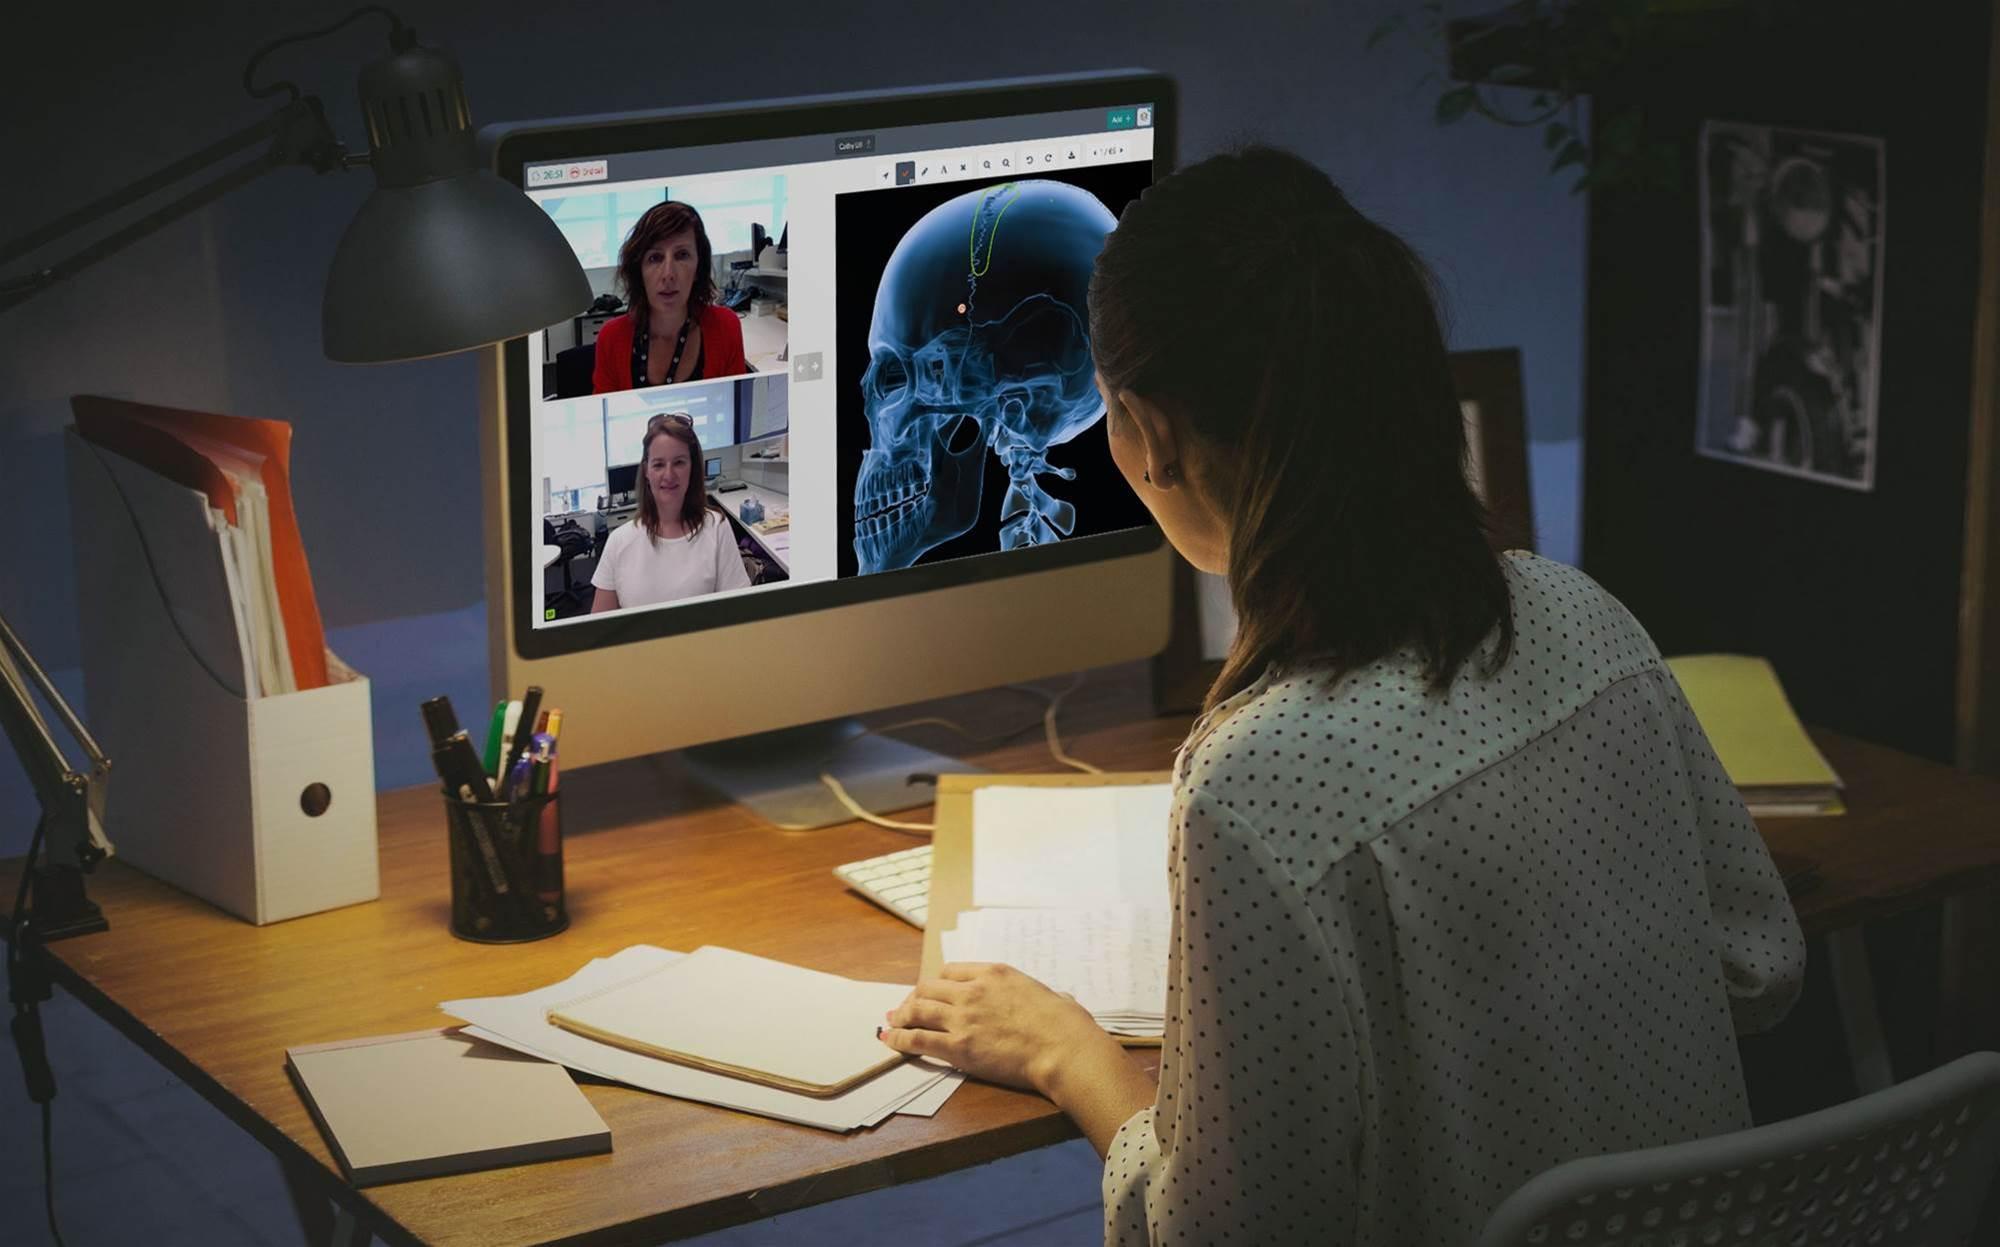 Swinburne taps Data61 spin-out for telehealth education